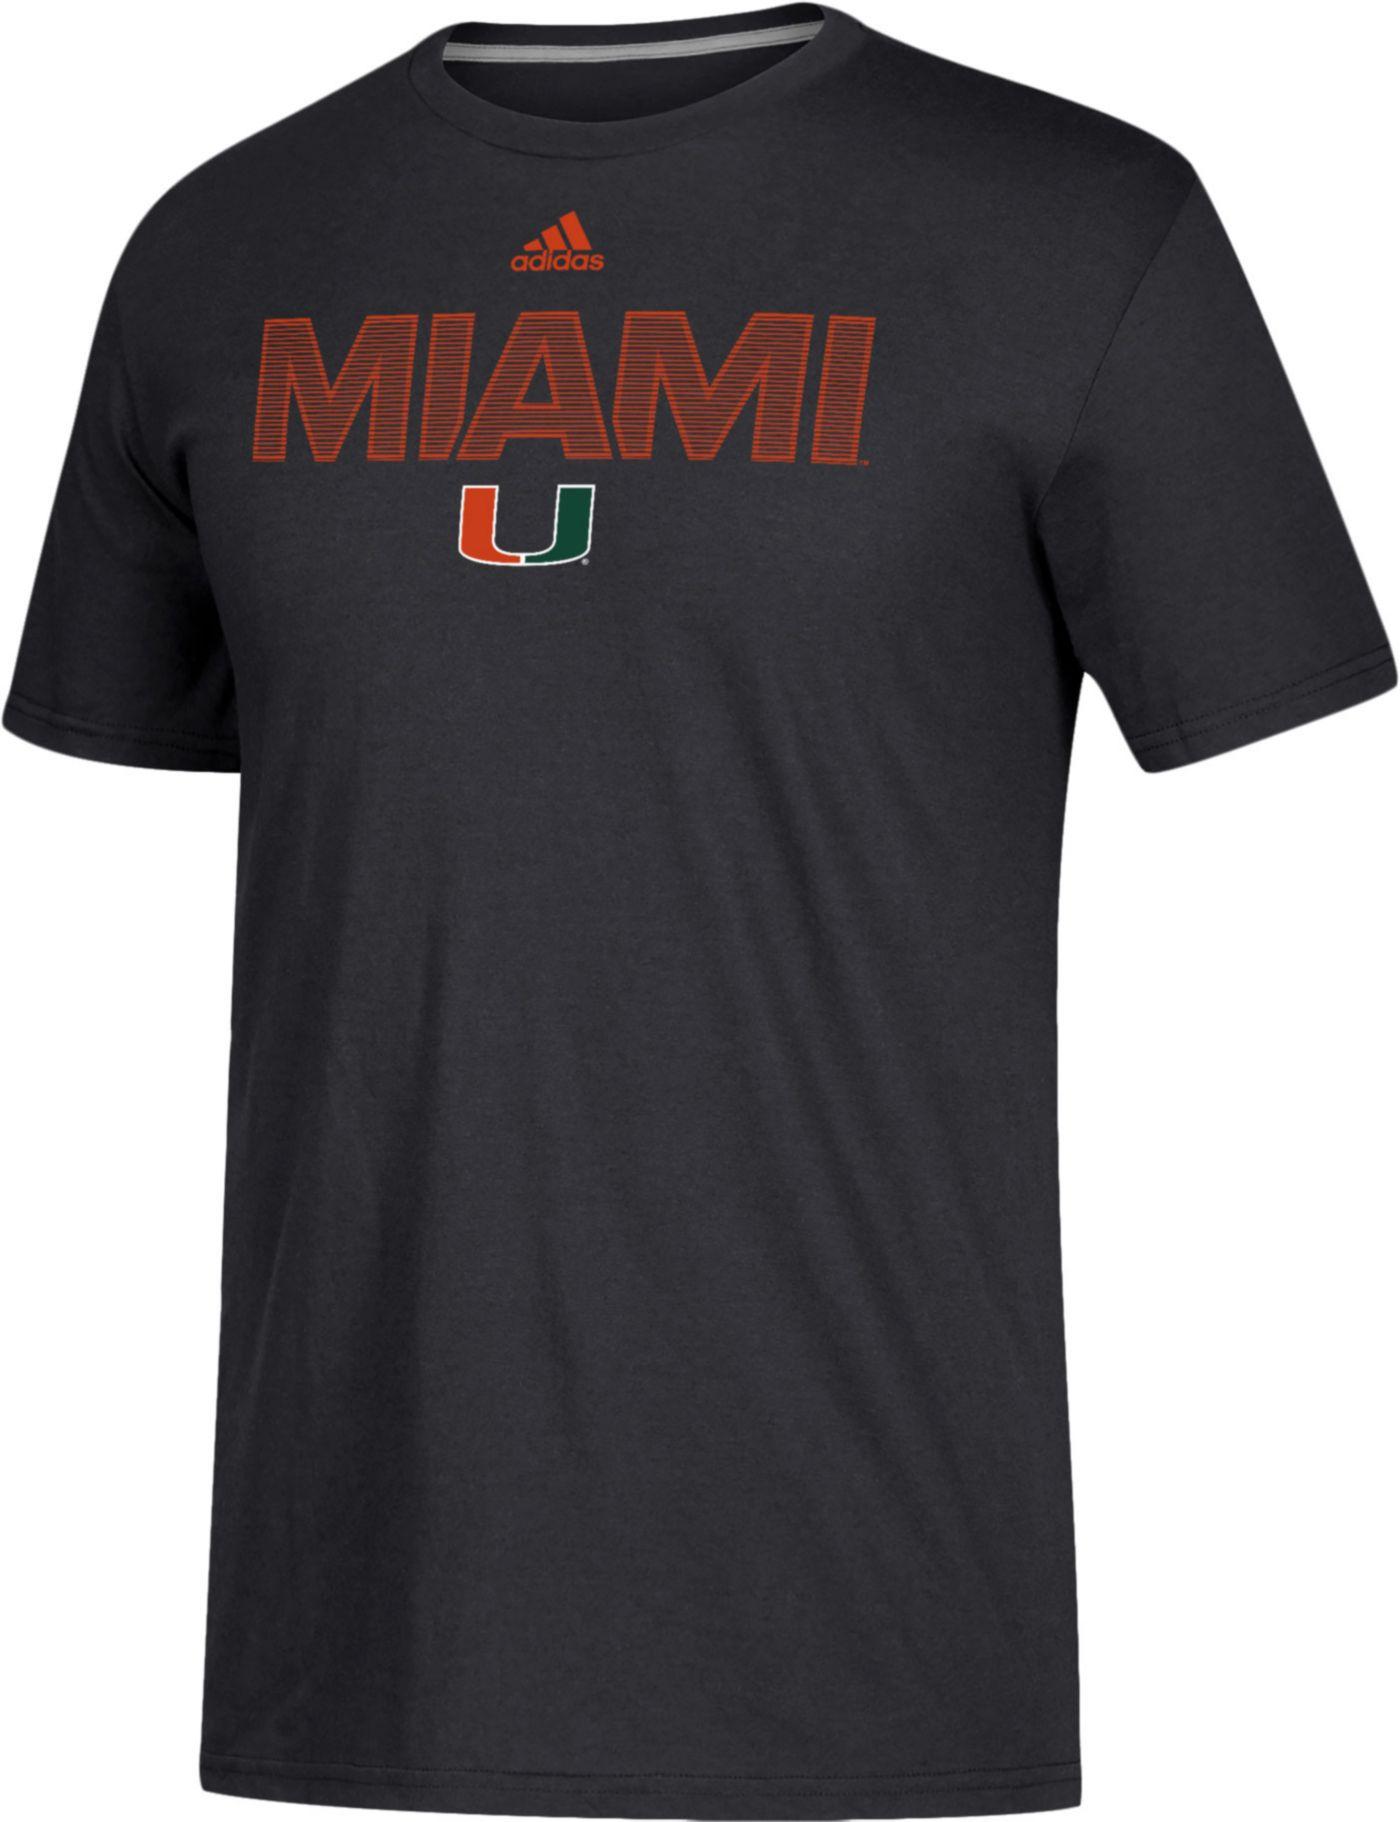 adidas Men's Miami Hurricanes Go-To Performance Black T-Shirt